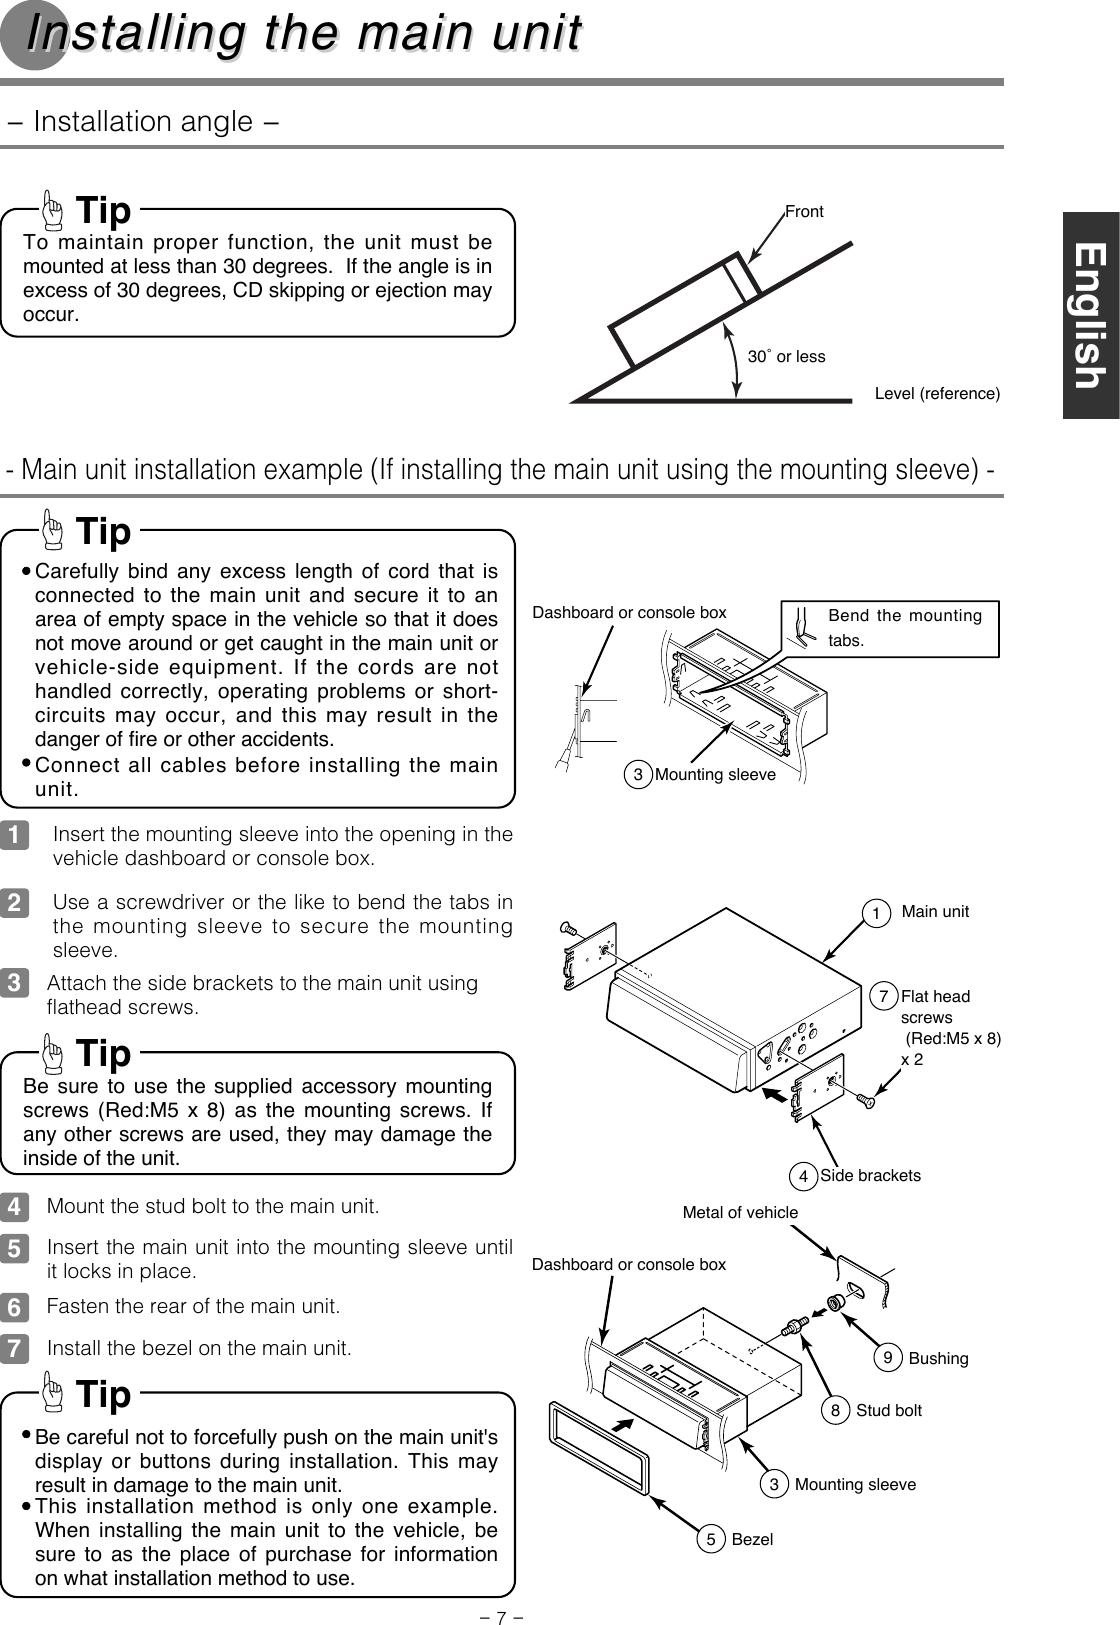 Eclipse Fujitsu Ten Marine Radio Cd 8445e Users Manual 3 28780 8445 Wiring Diagram Page 7 Of 8